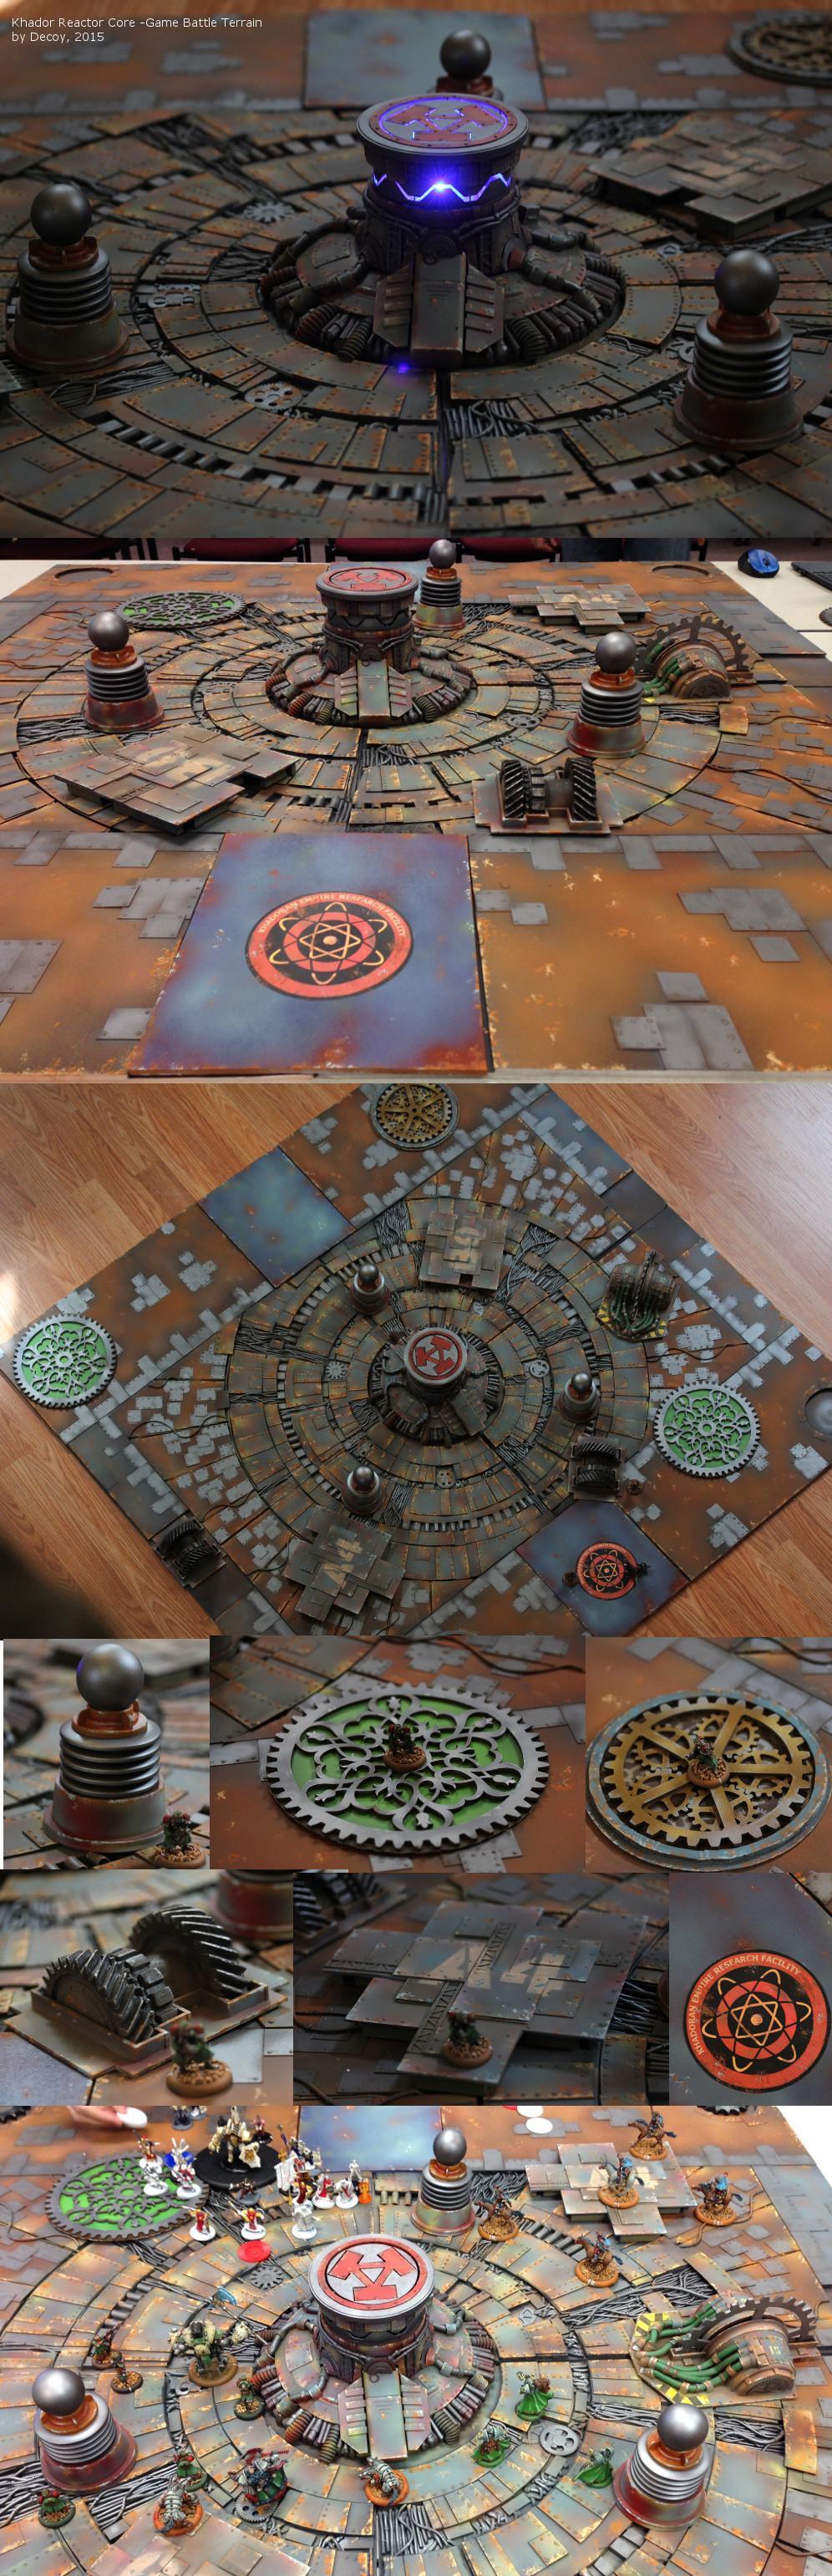 Artefact, Butcher, Cryx, Cygnar, Gameboard, Khador, Protectorate Of Menoth, Steampunk, Terrain, Warmachine